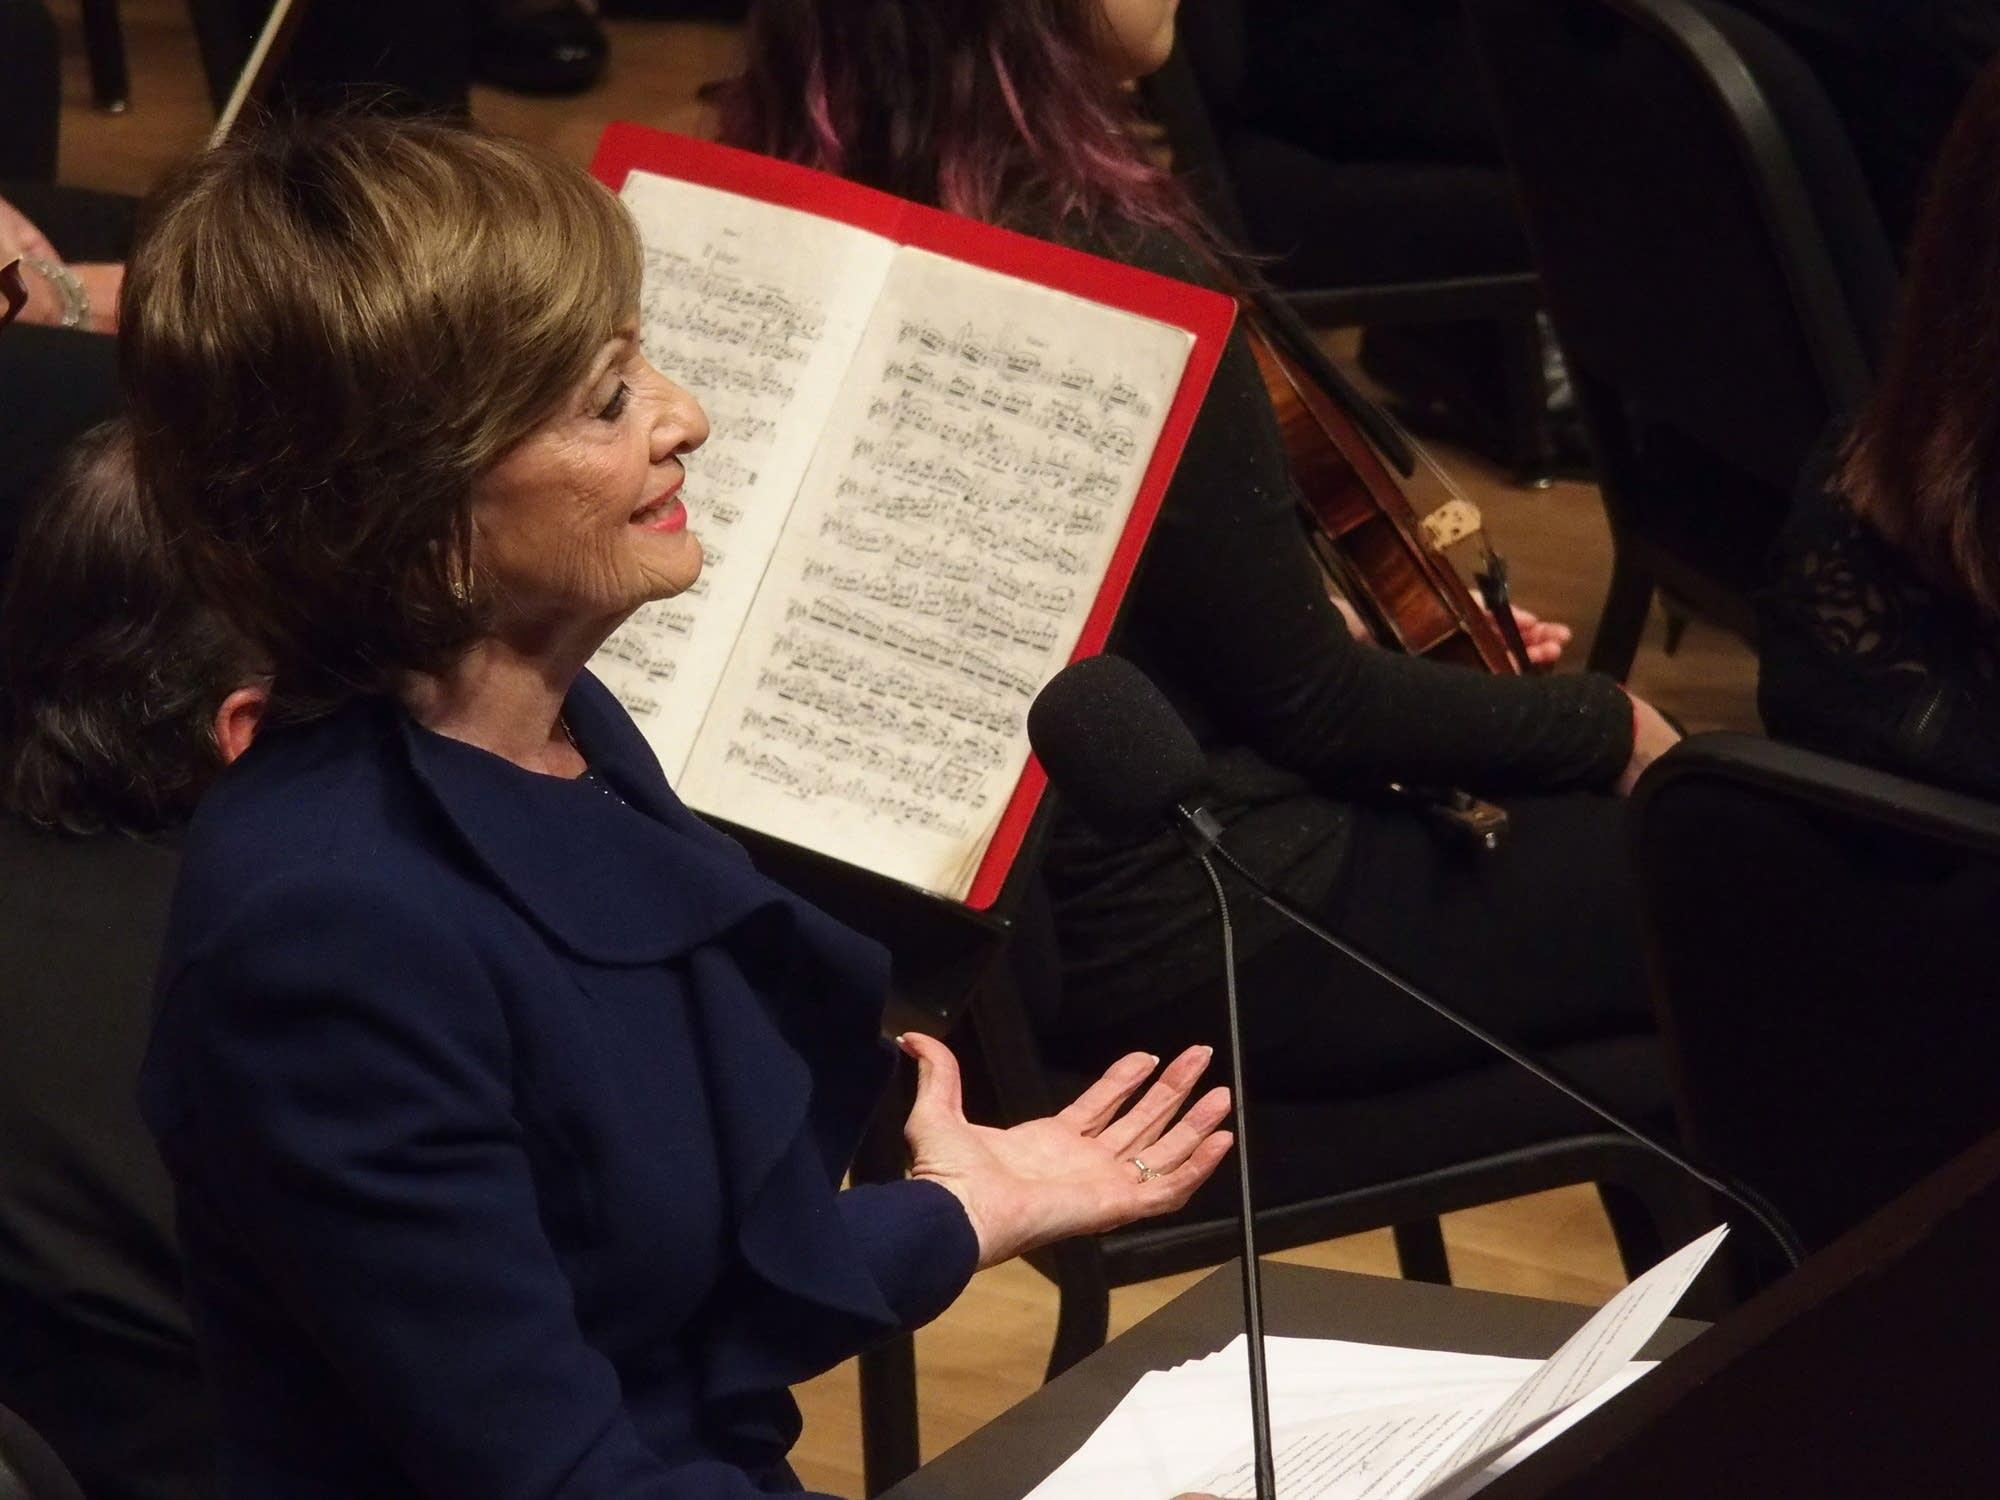 Minnesota Orchestra Board Chair Marilyn Carlson Nelson